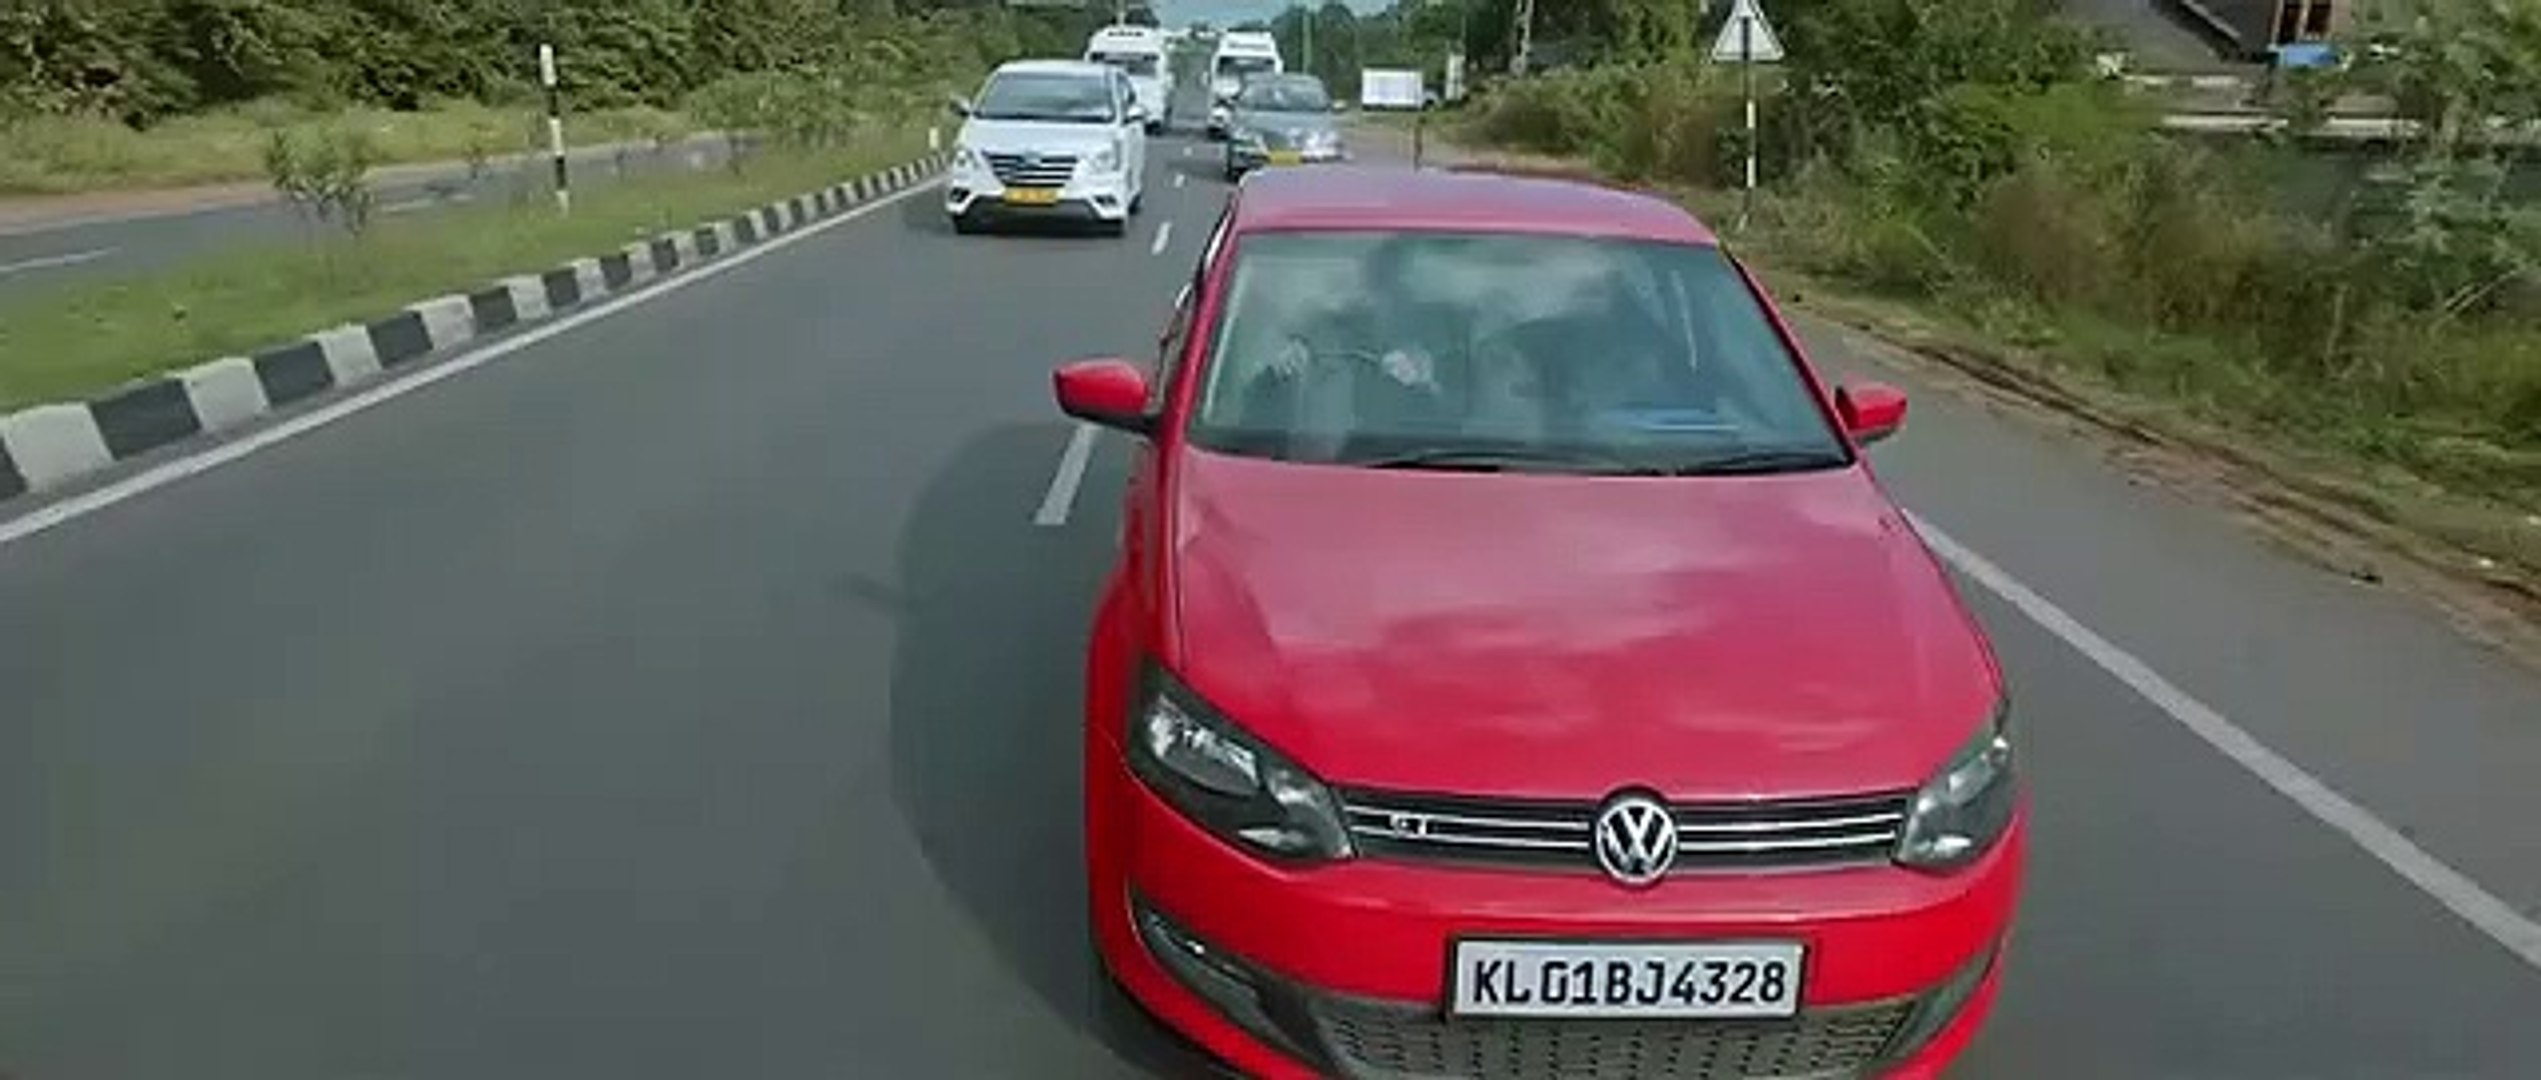 Forensic Malayalam Part 3 Video Dailymotion